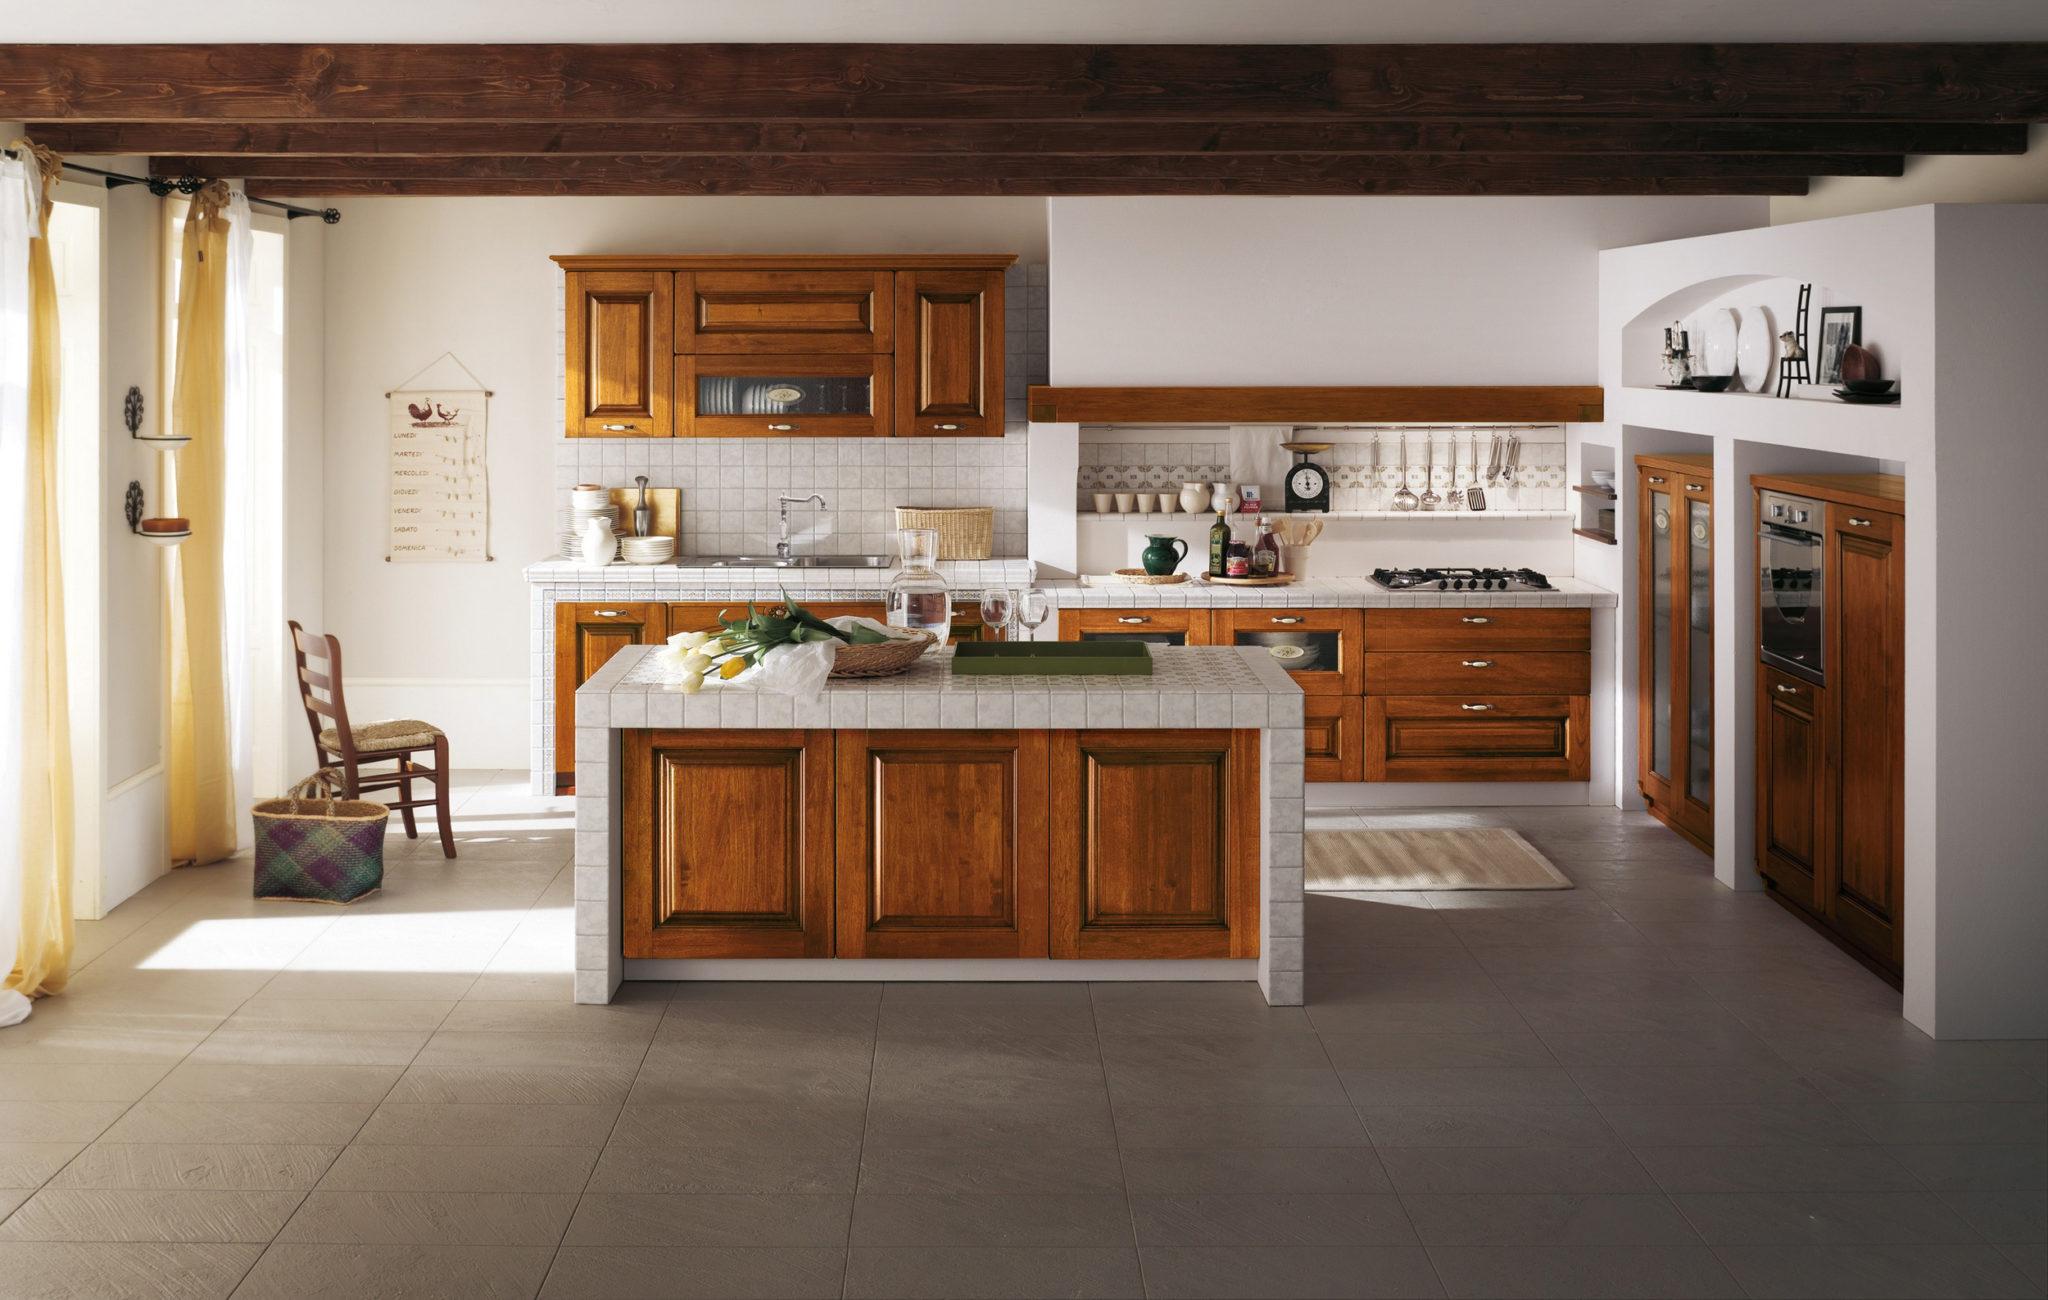 Cucine componibili classiche e moderne maiorani arredamenti - Aerre cucine classiche ...